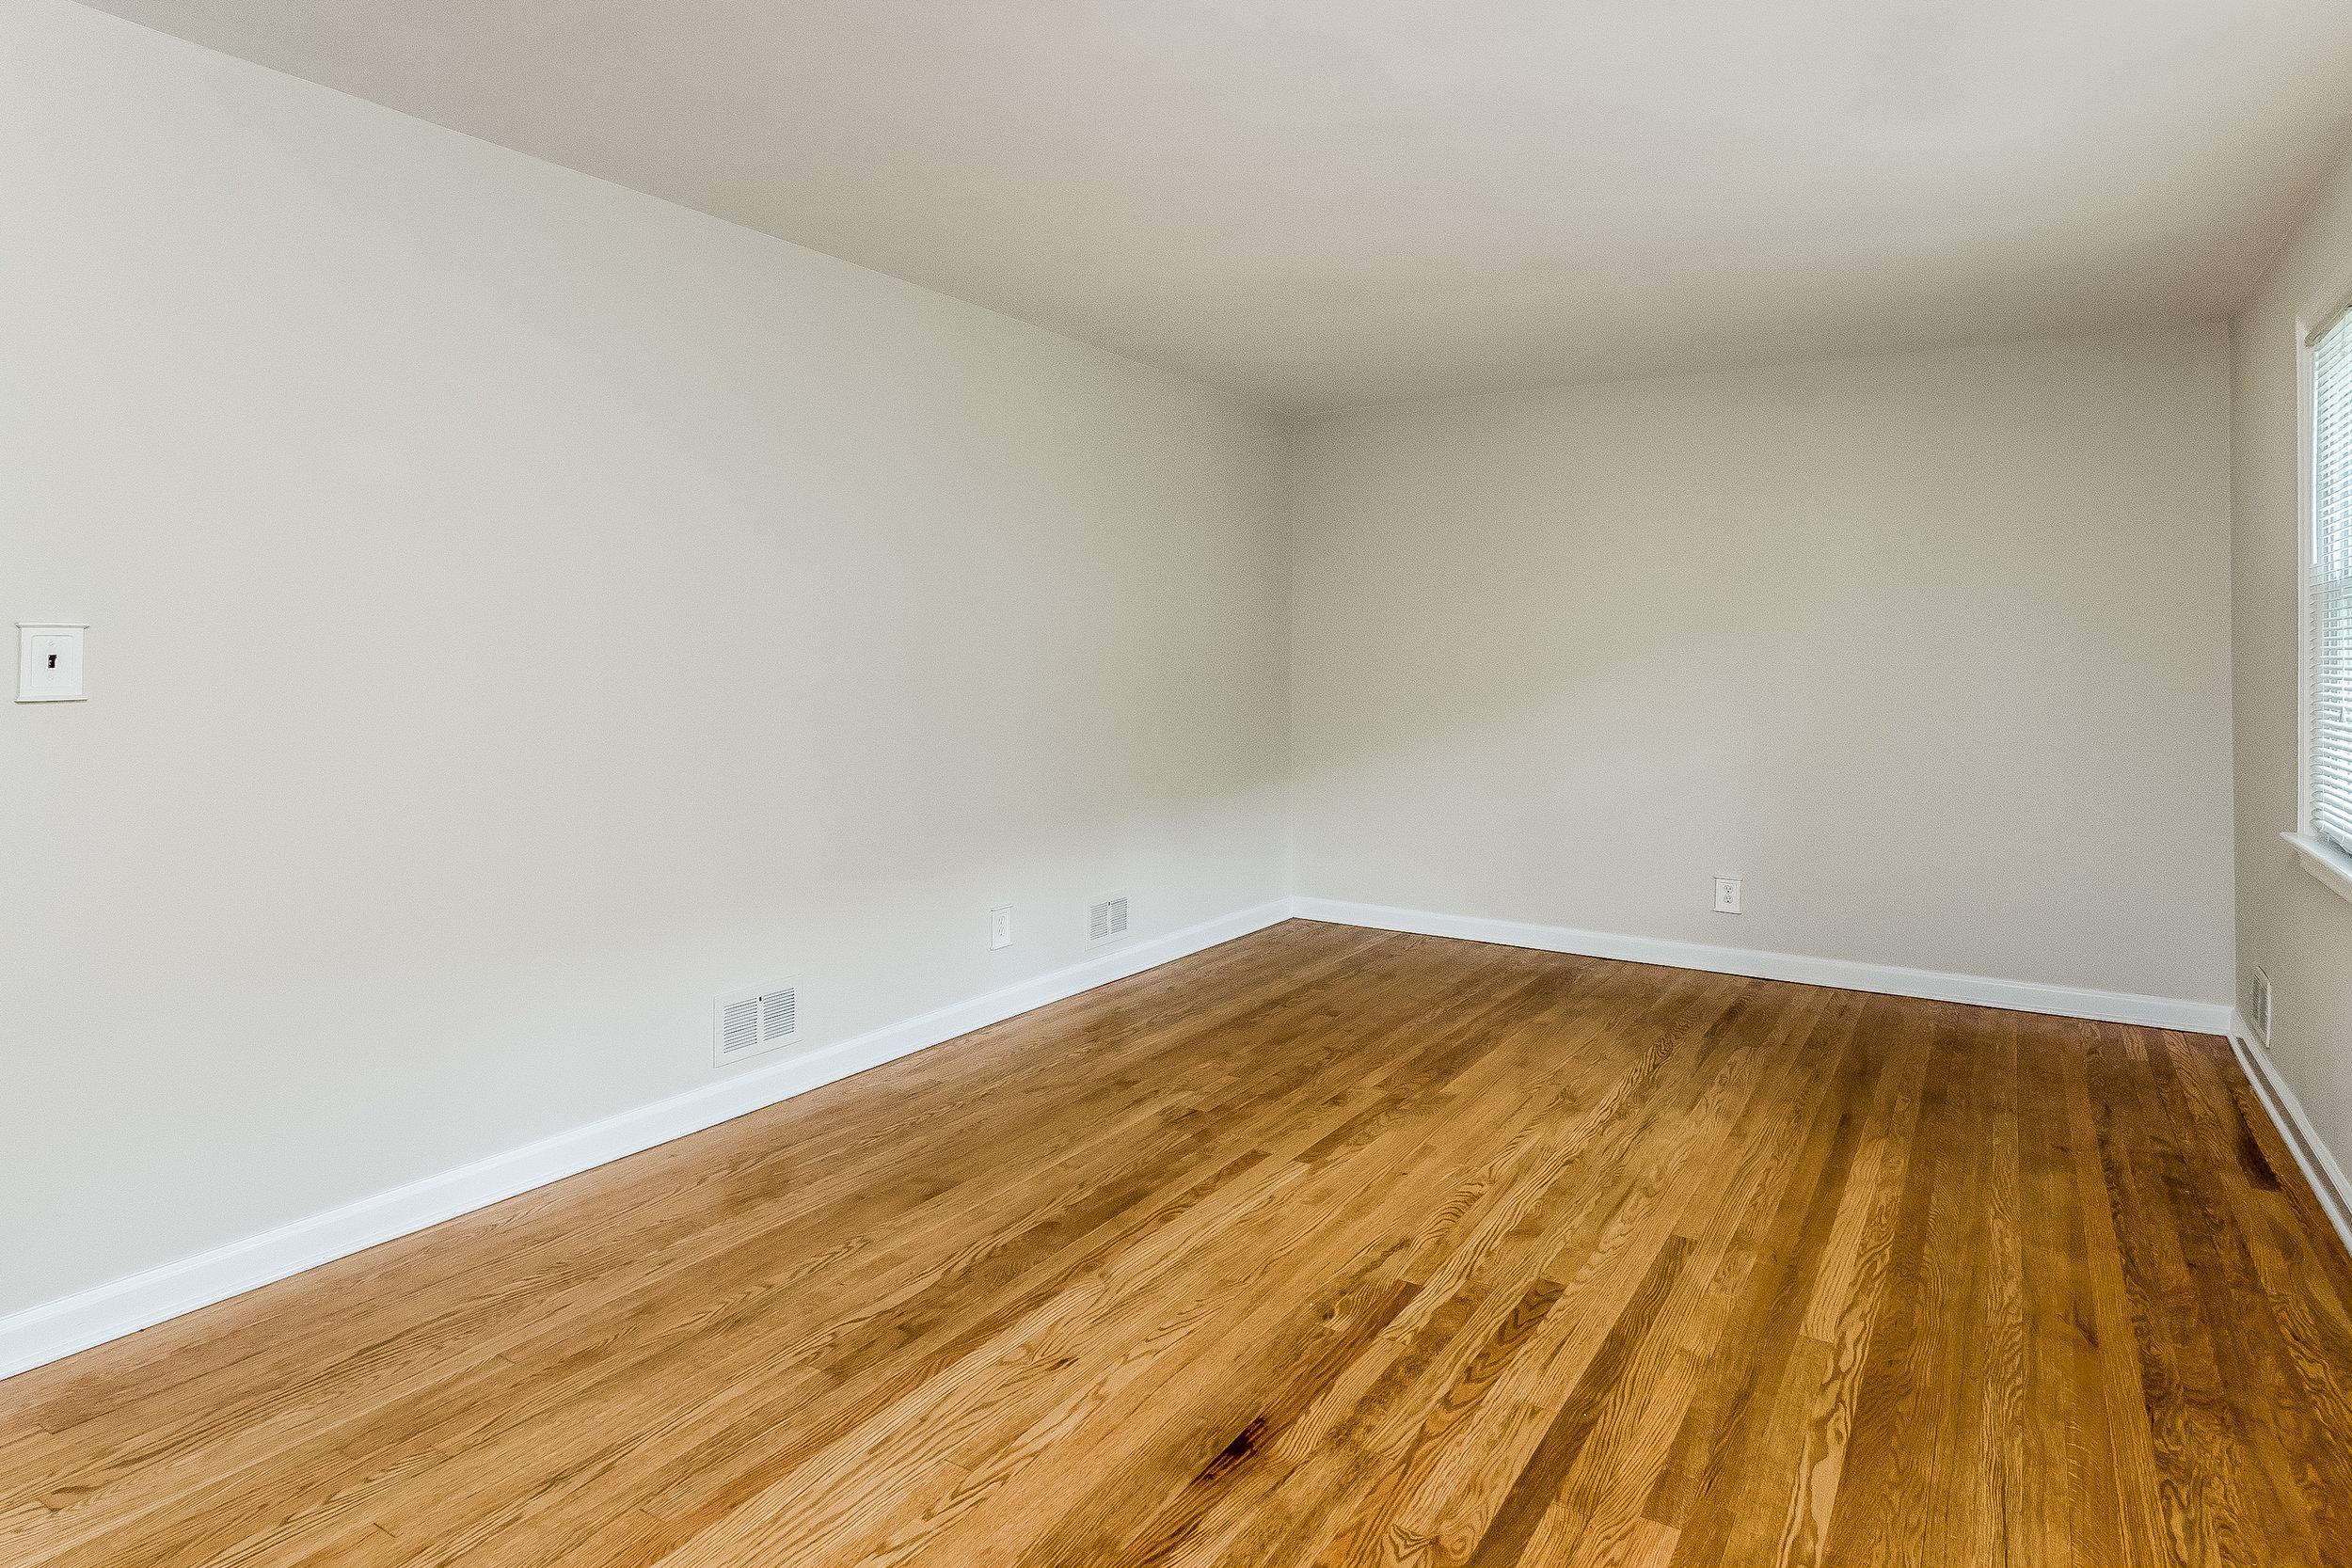 005-photo-living-room-5786543.jpg